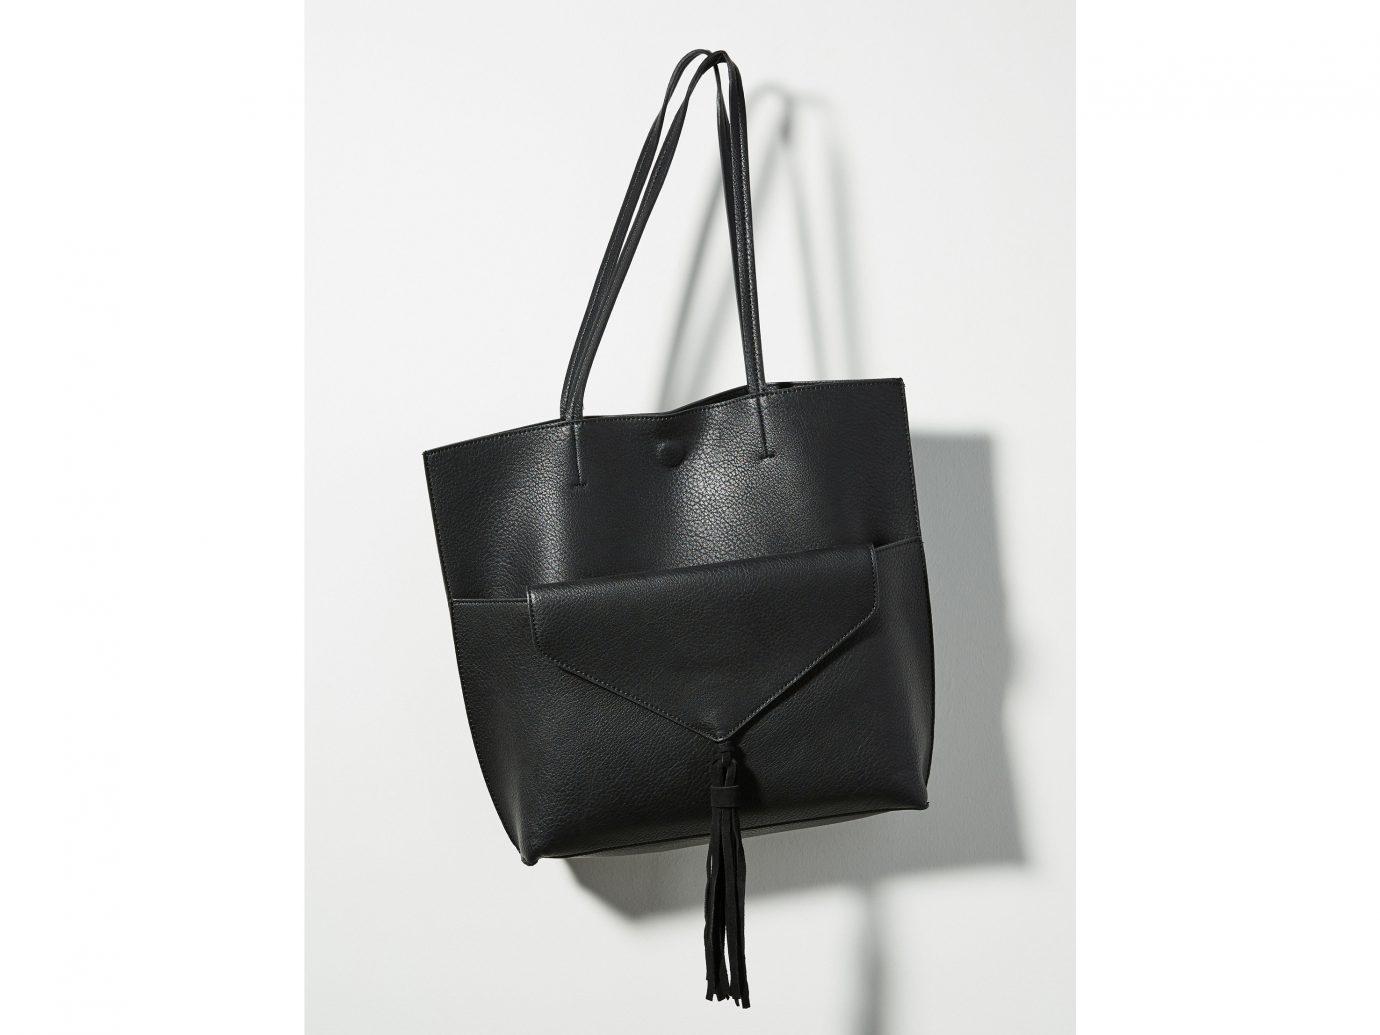 Packing Tips Style + Design Travel Shop Weekend Getaways bag handbag black shoulder bag fashion accessory product leather tote bag product design brand luggage & bags